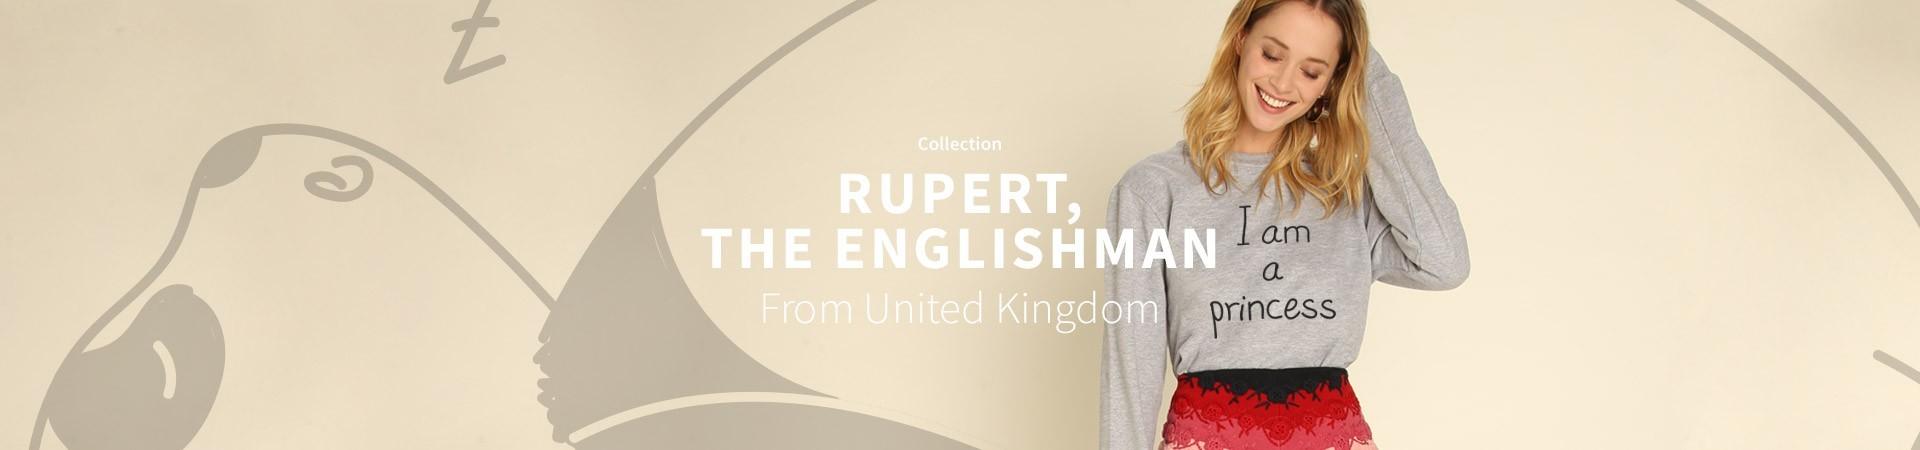 Rupert the Englishman